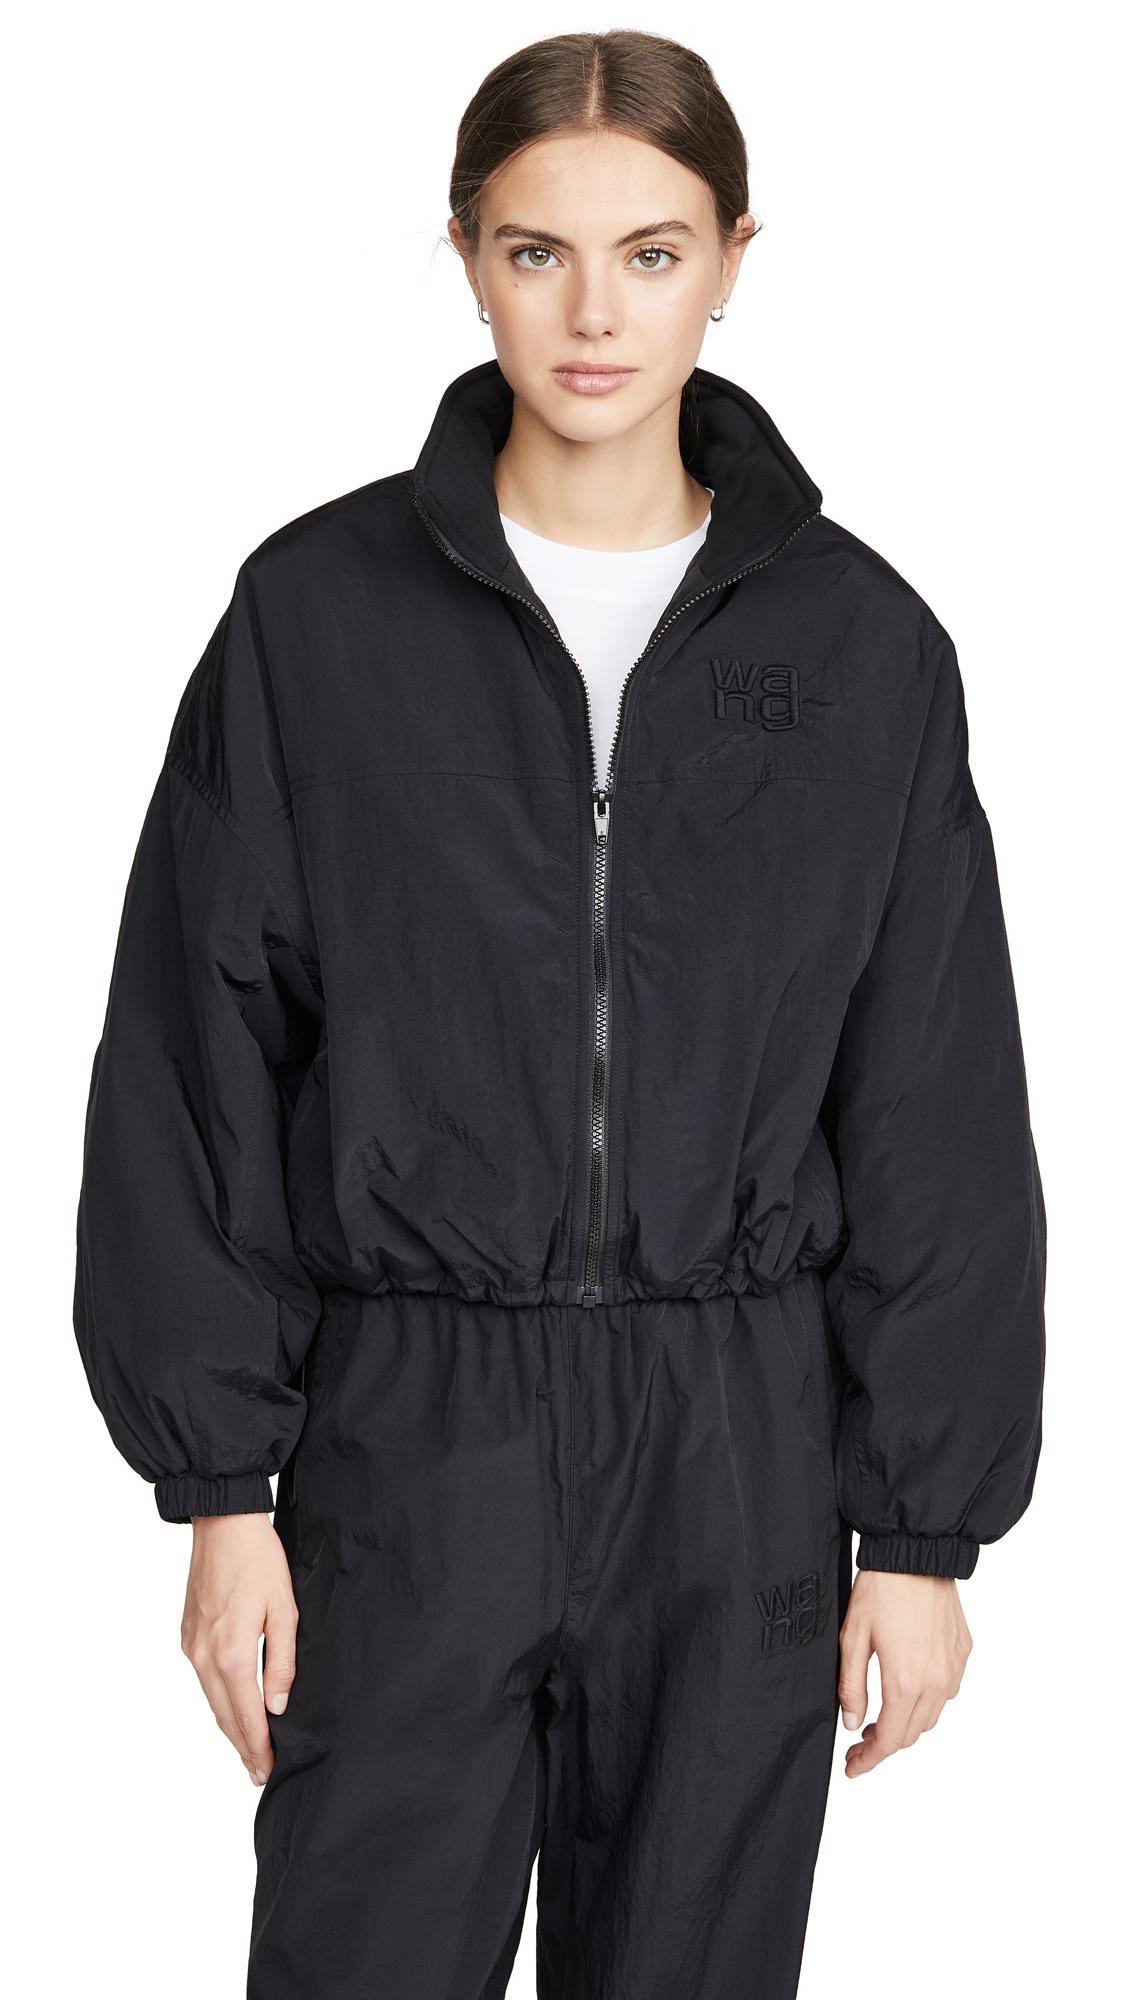 Buy alexanderwang.t Nylon Zip Jacket with Logo online beautiful alexanderwang.t Jackets, Coats, Coats